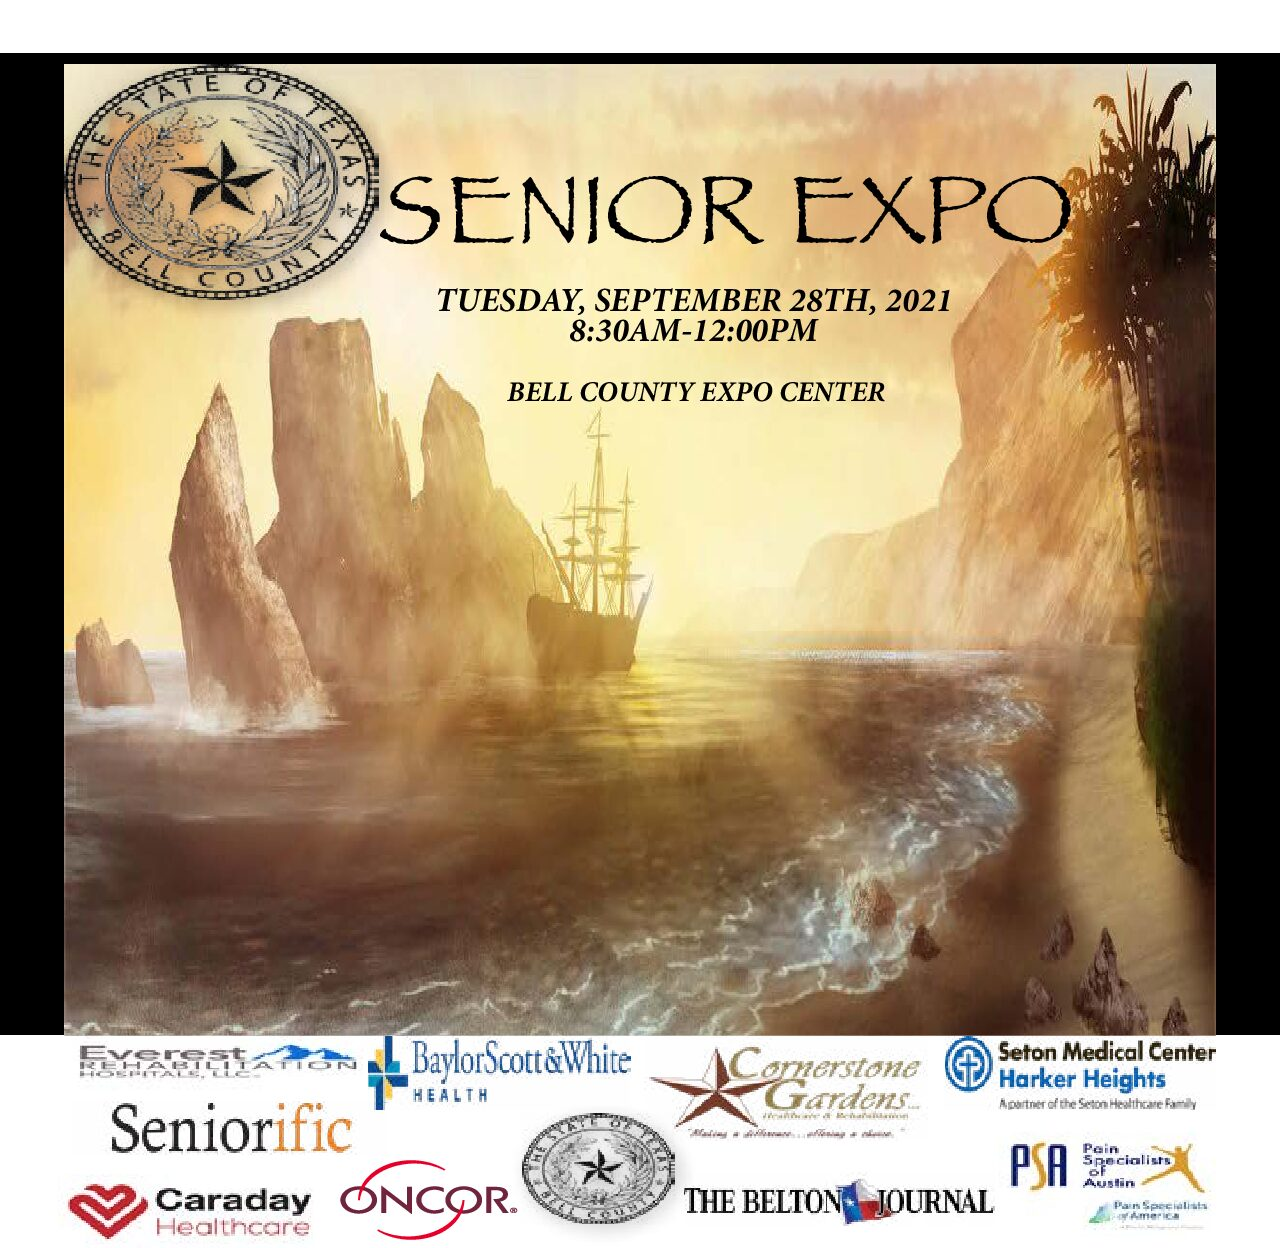 Bell County Senior Expo